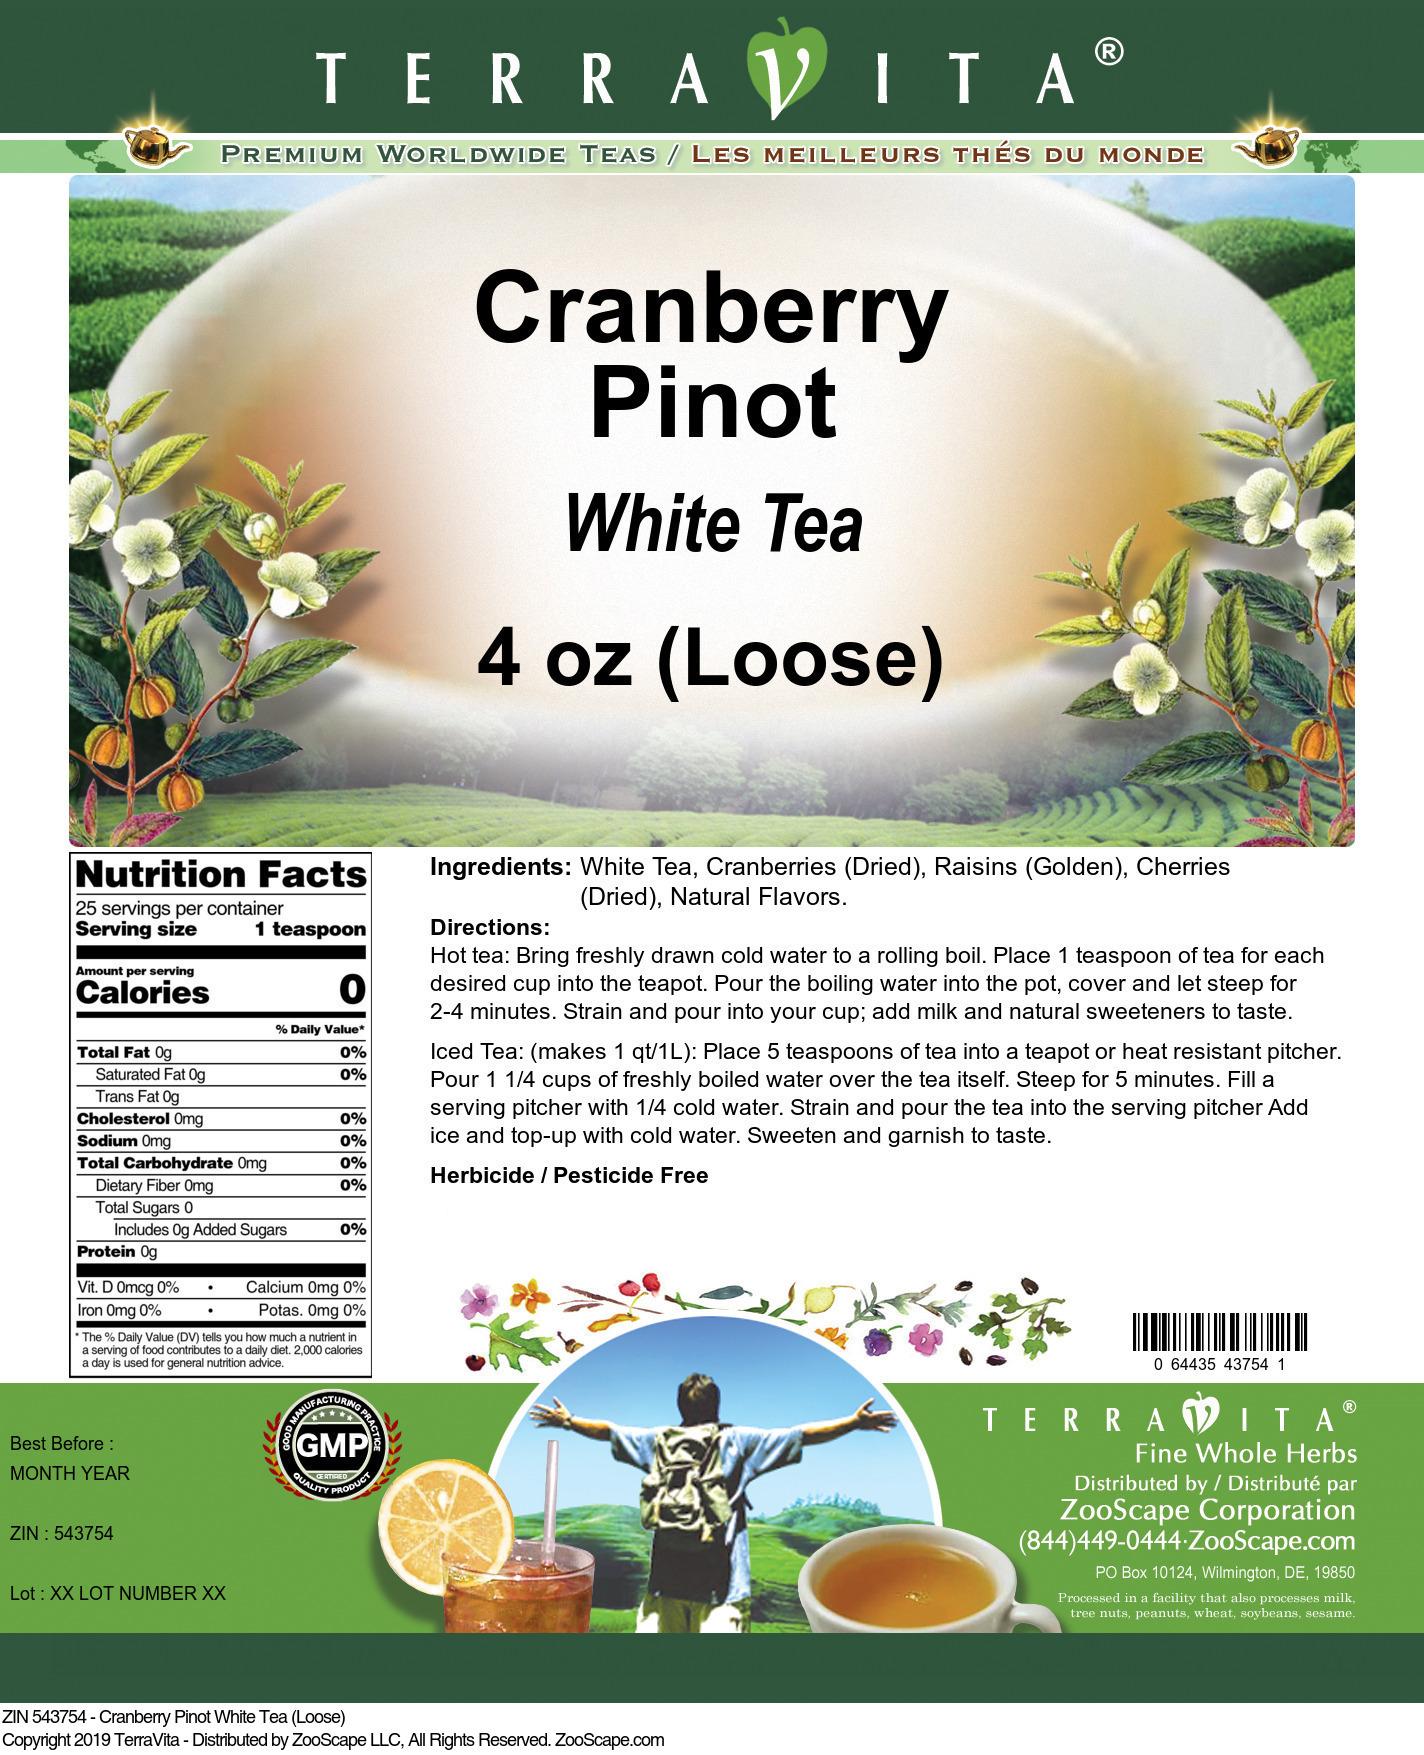 Cranberry Pinot White Tea (Loose)